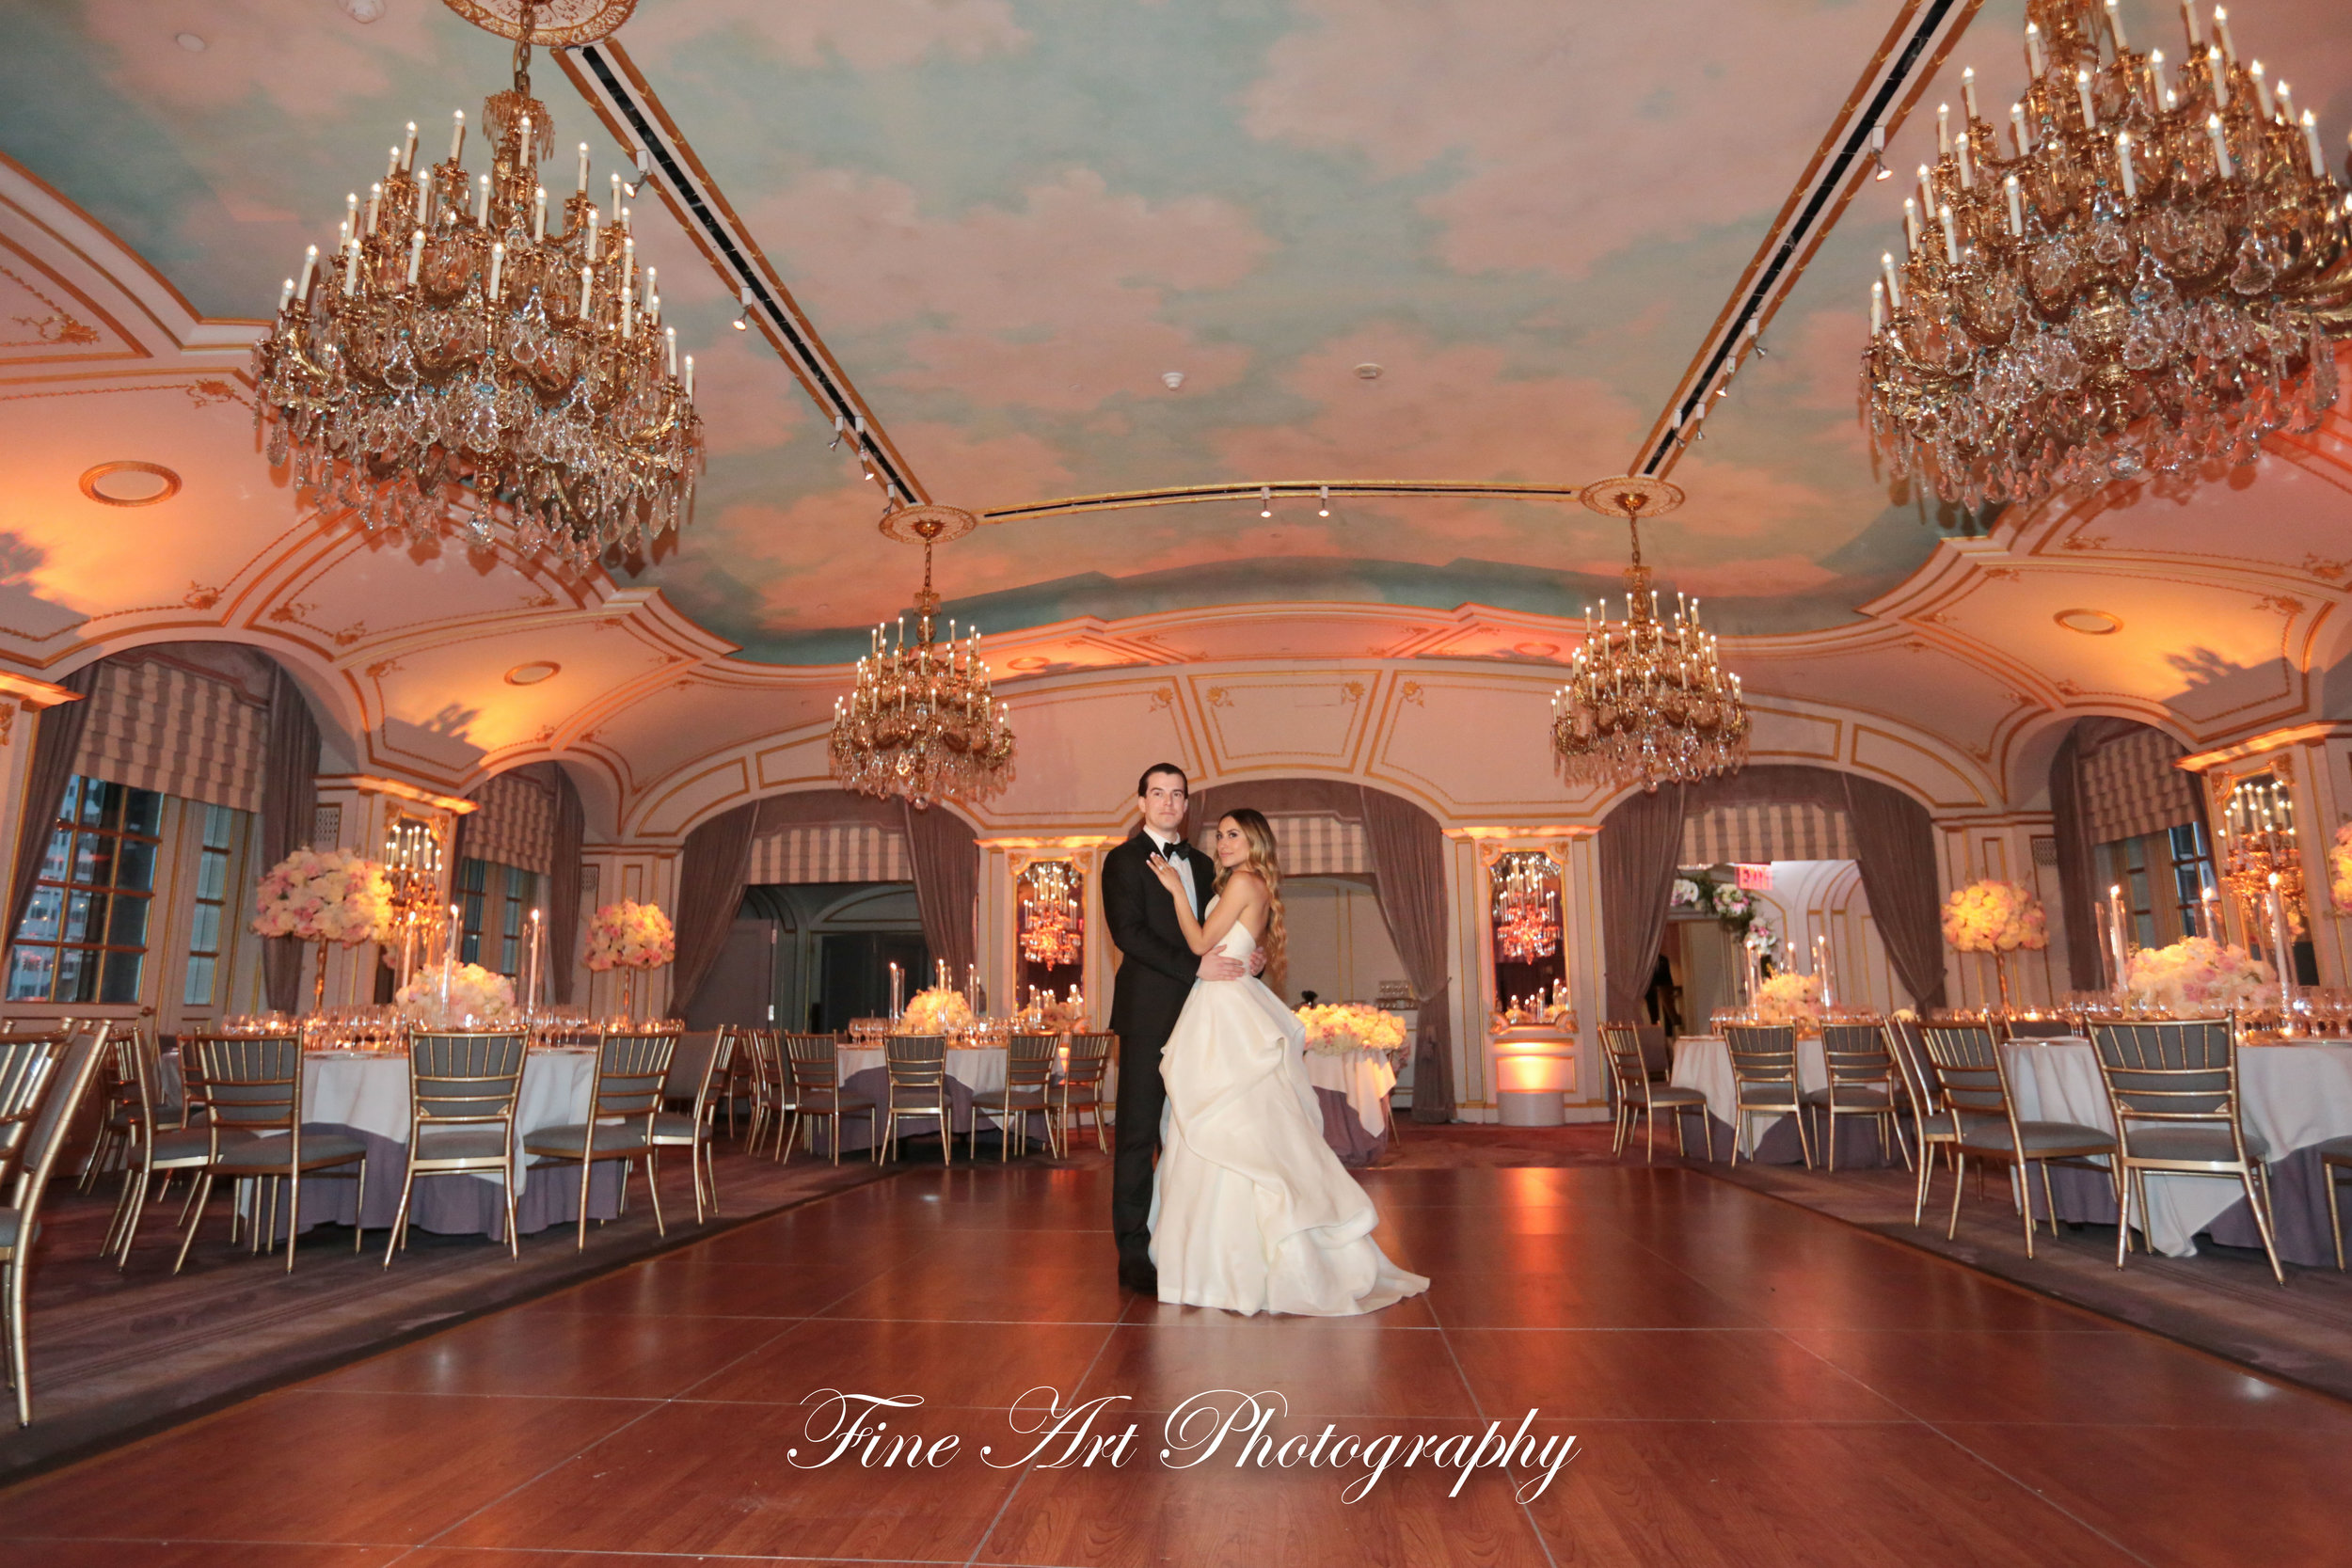 Photographer - Fine Art Photography